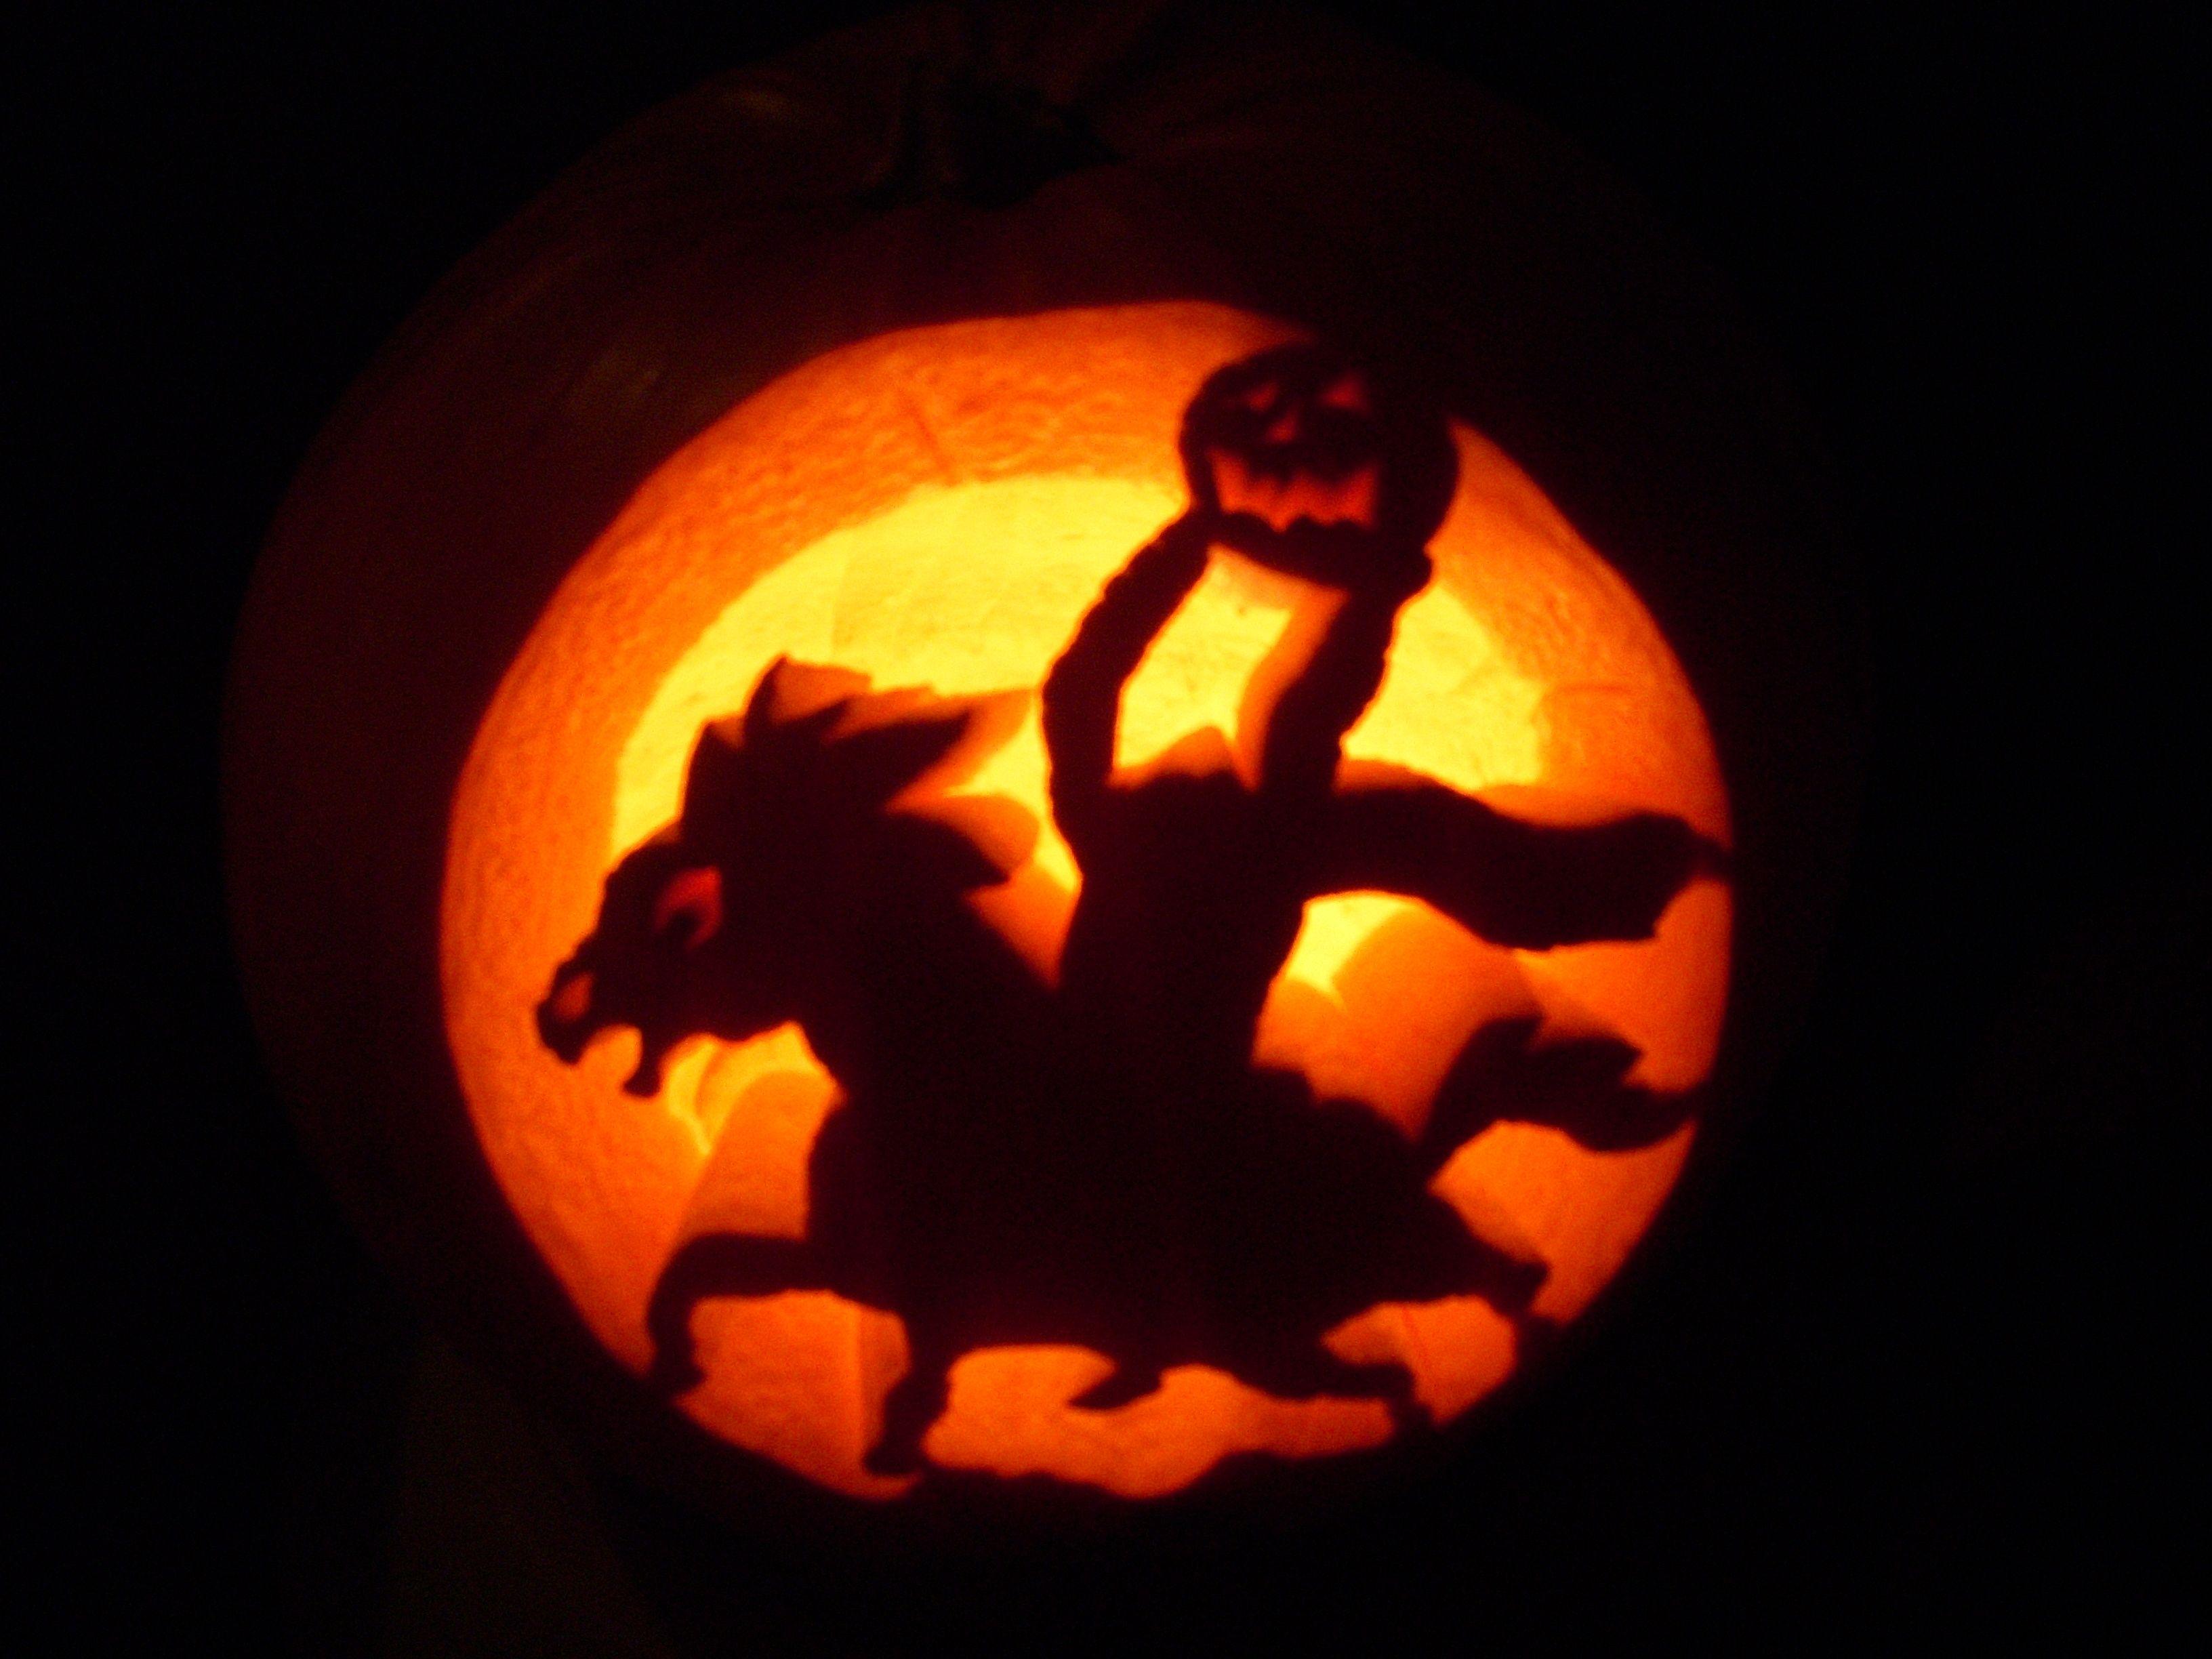 The Headless Horseman Pumpkin Carving Headless Horseman Carving